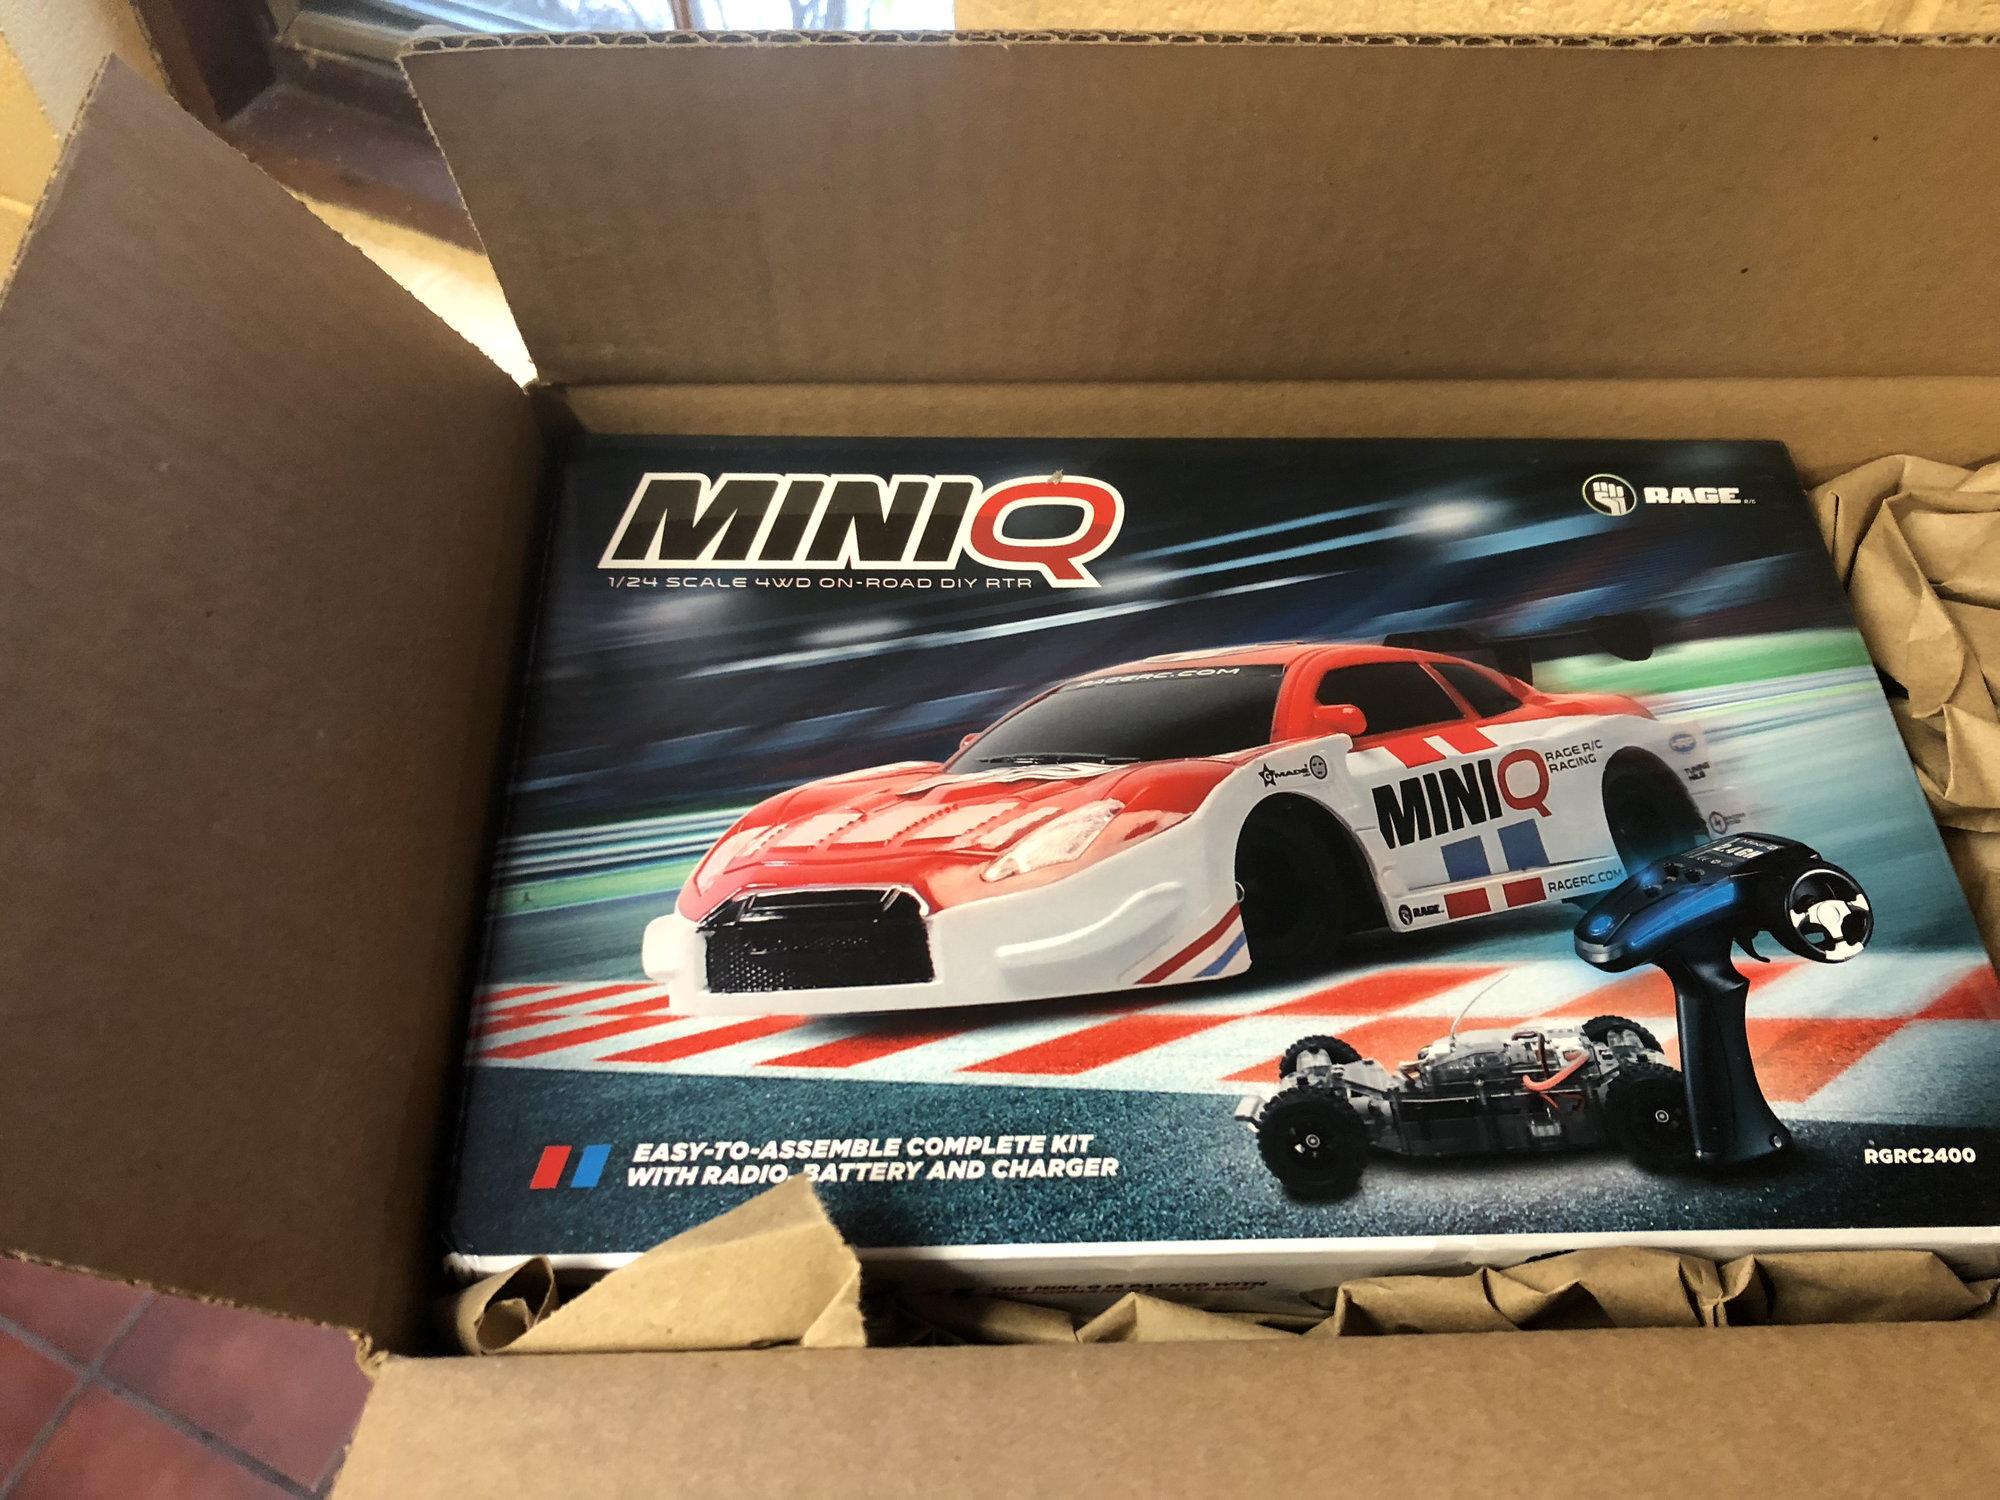 Rage R//C Mini-Q 1//24 Scale 4WD On-Road DIY RTR